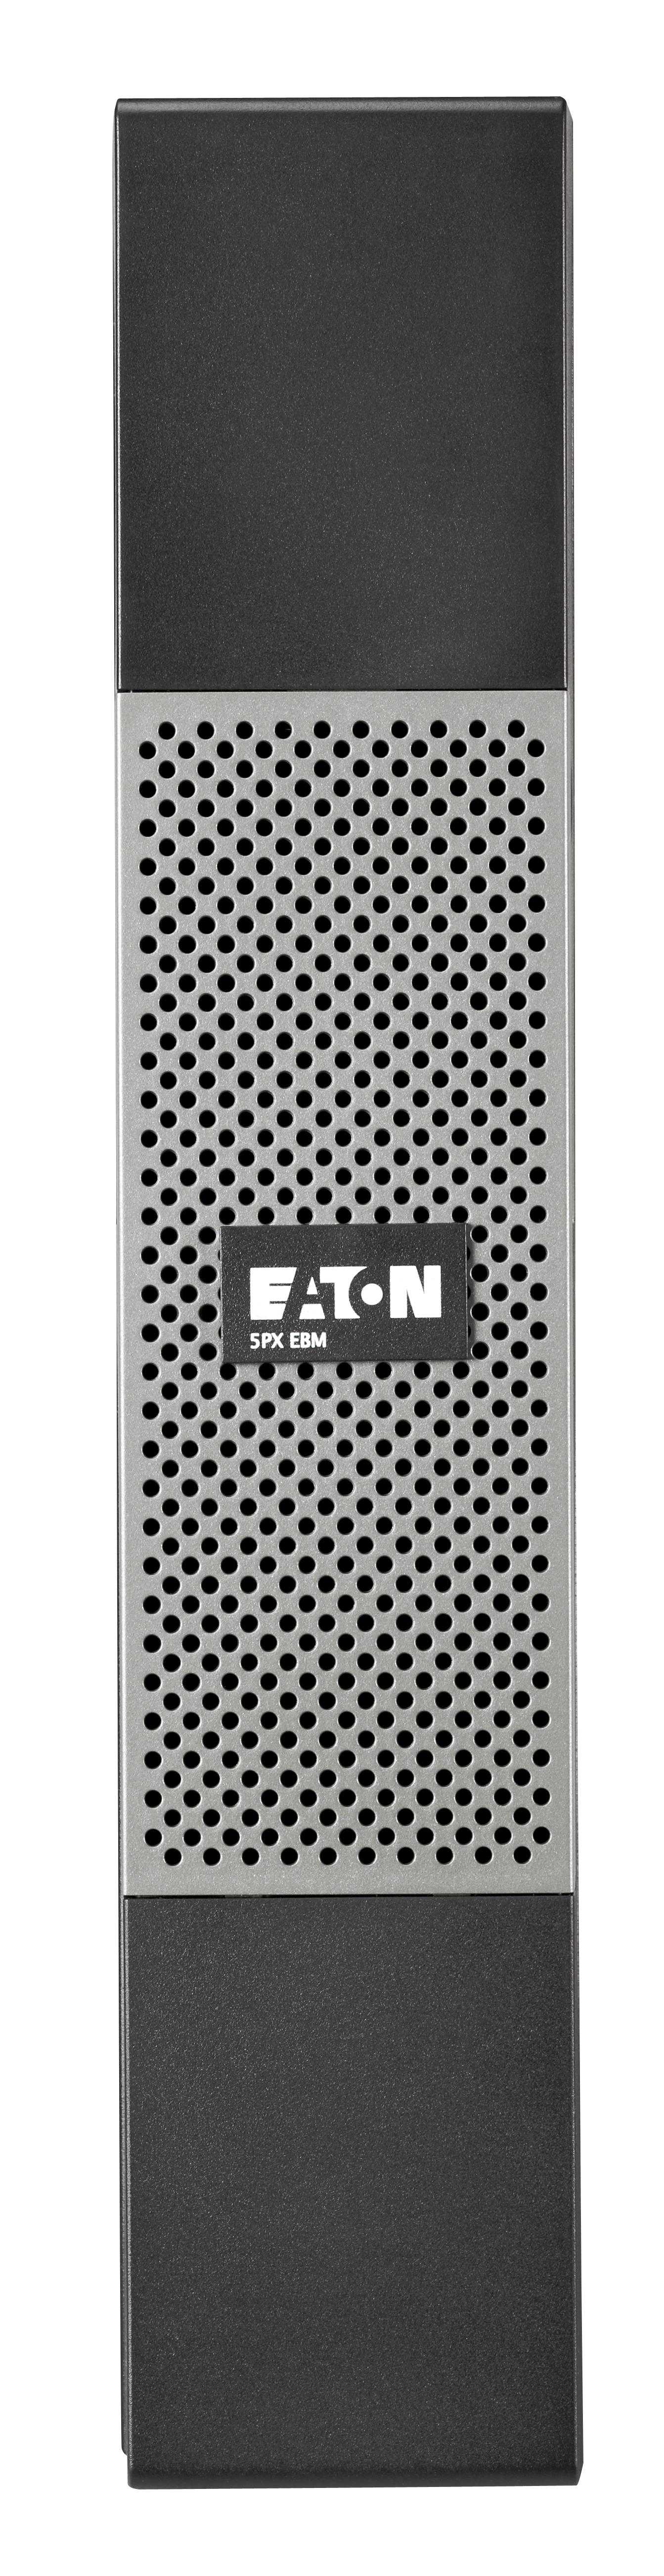 EATON - MODULO EXT BATERIA EATON 5PX EBM 72V RT2U P /  5PX 3000 RT2U